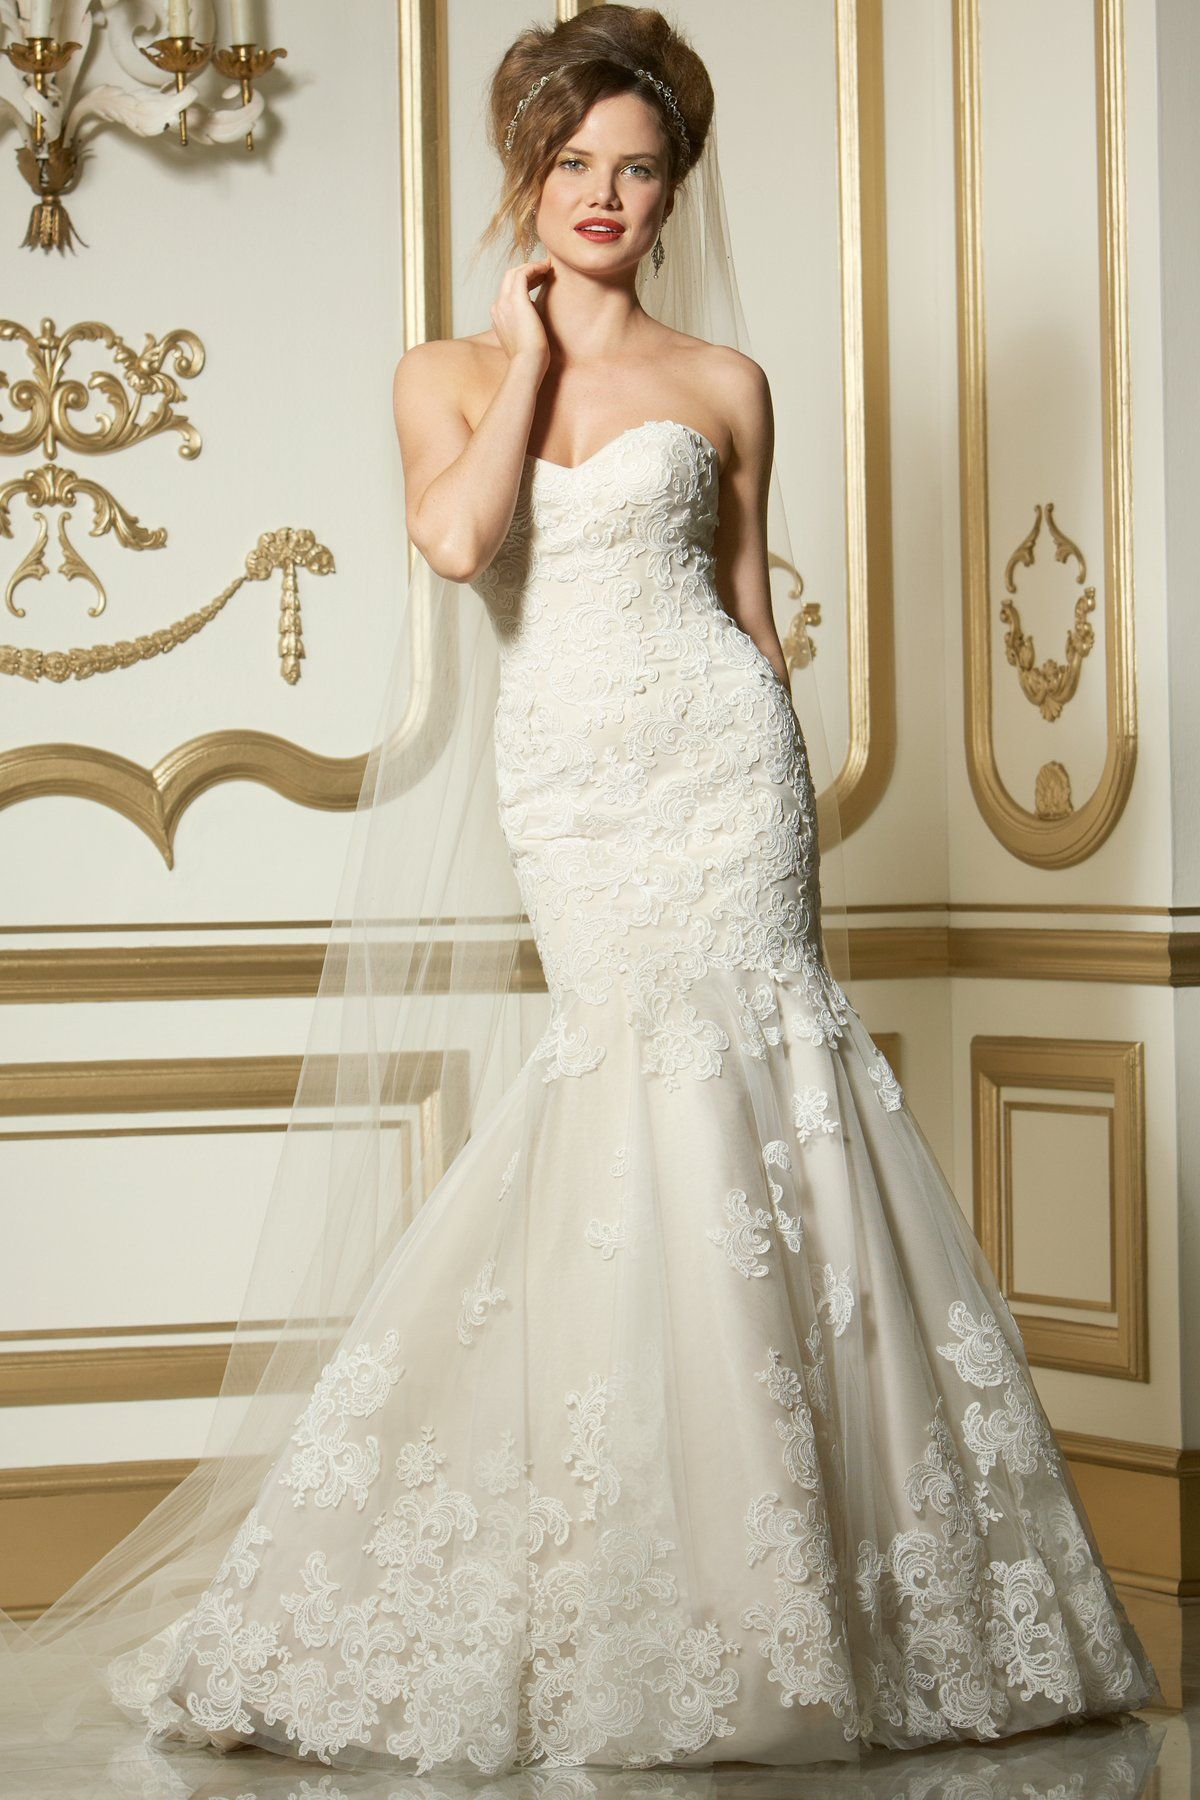 Blush mermaid wedding dress  Wtoo by Watters Wedding Dress Flora   Watters wedding dresses